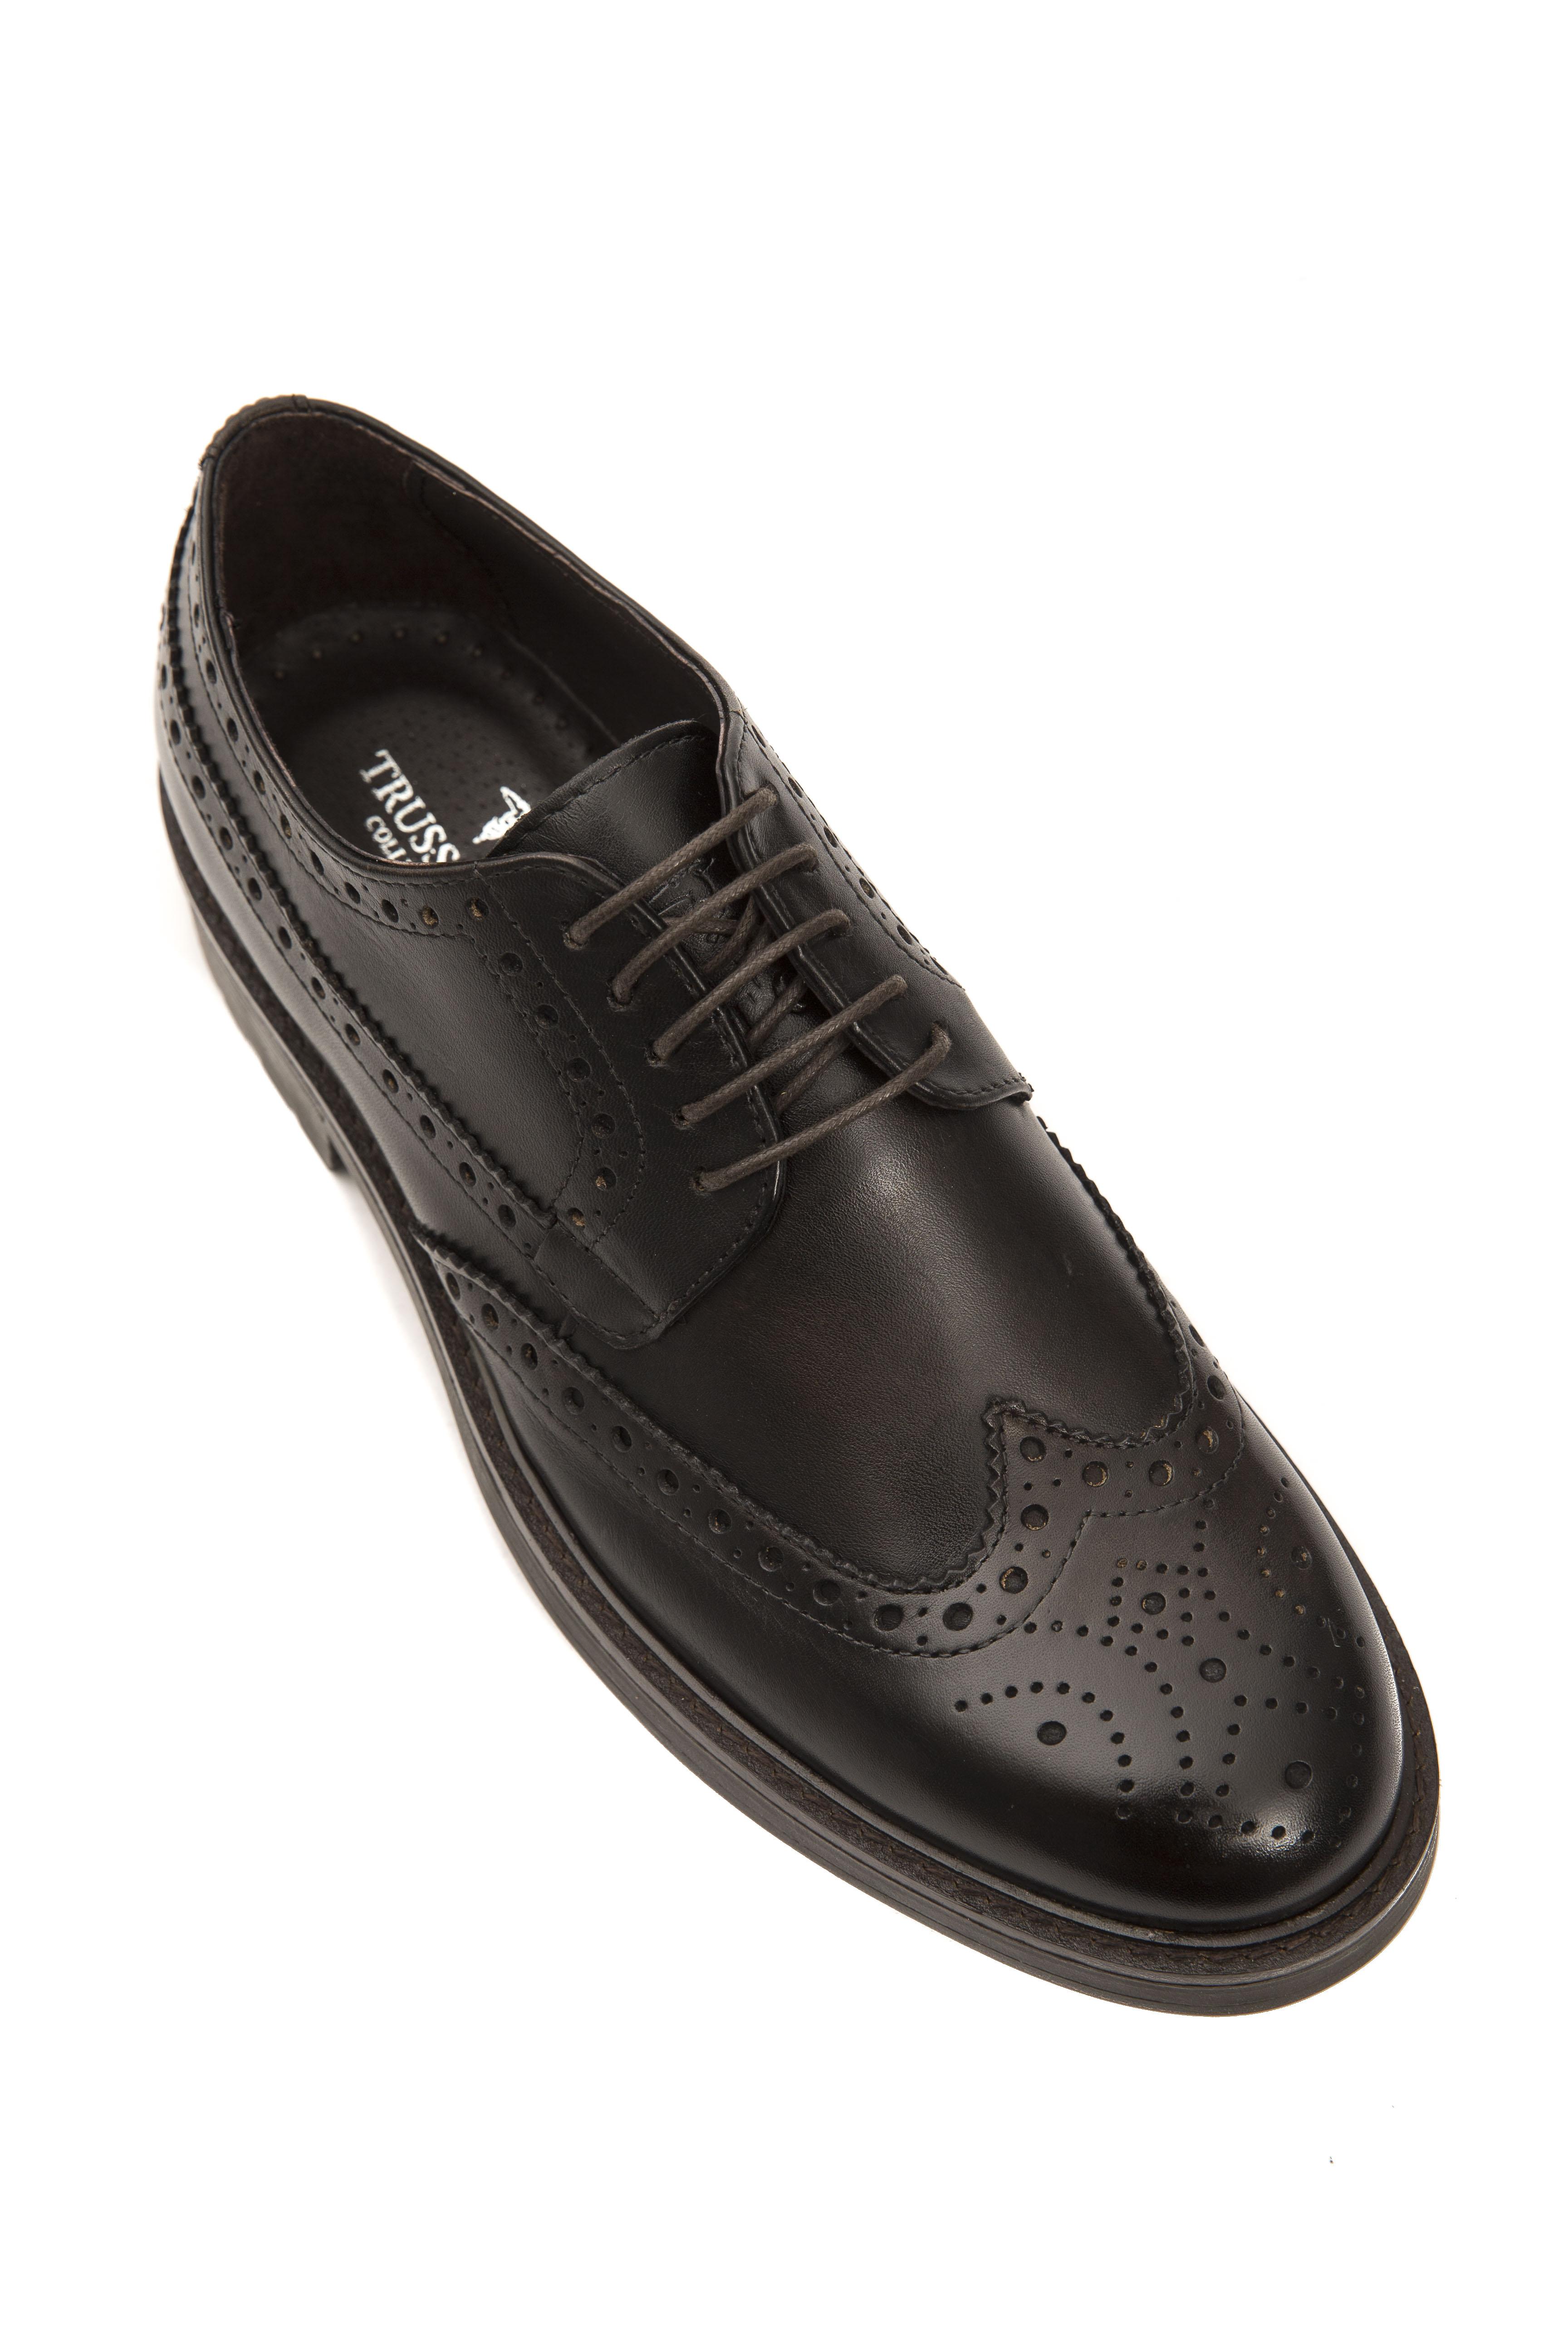 Collection Trussardi Bigarello Chaussures Marron Chaussures Marron Trussardi dQhtsrC